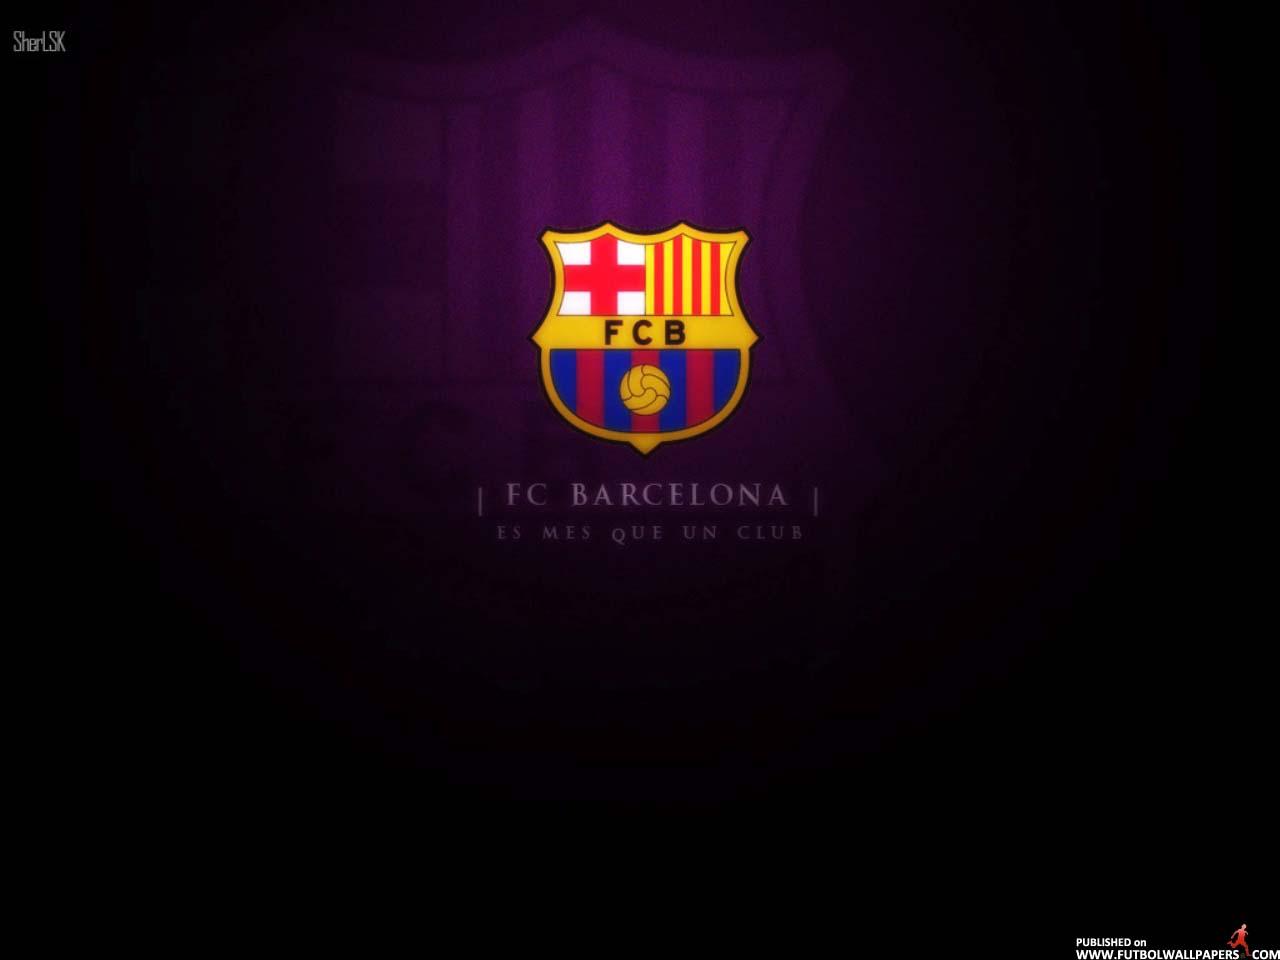 http://3.bp.blogspot.com/-ztGCUH8Pj-4/UFhFKZeZSzI/AAAAAAAAEUE/WuZ8RbW6T6k/s1600/FC-Barcelona-Wallpaper-274.jpg